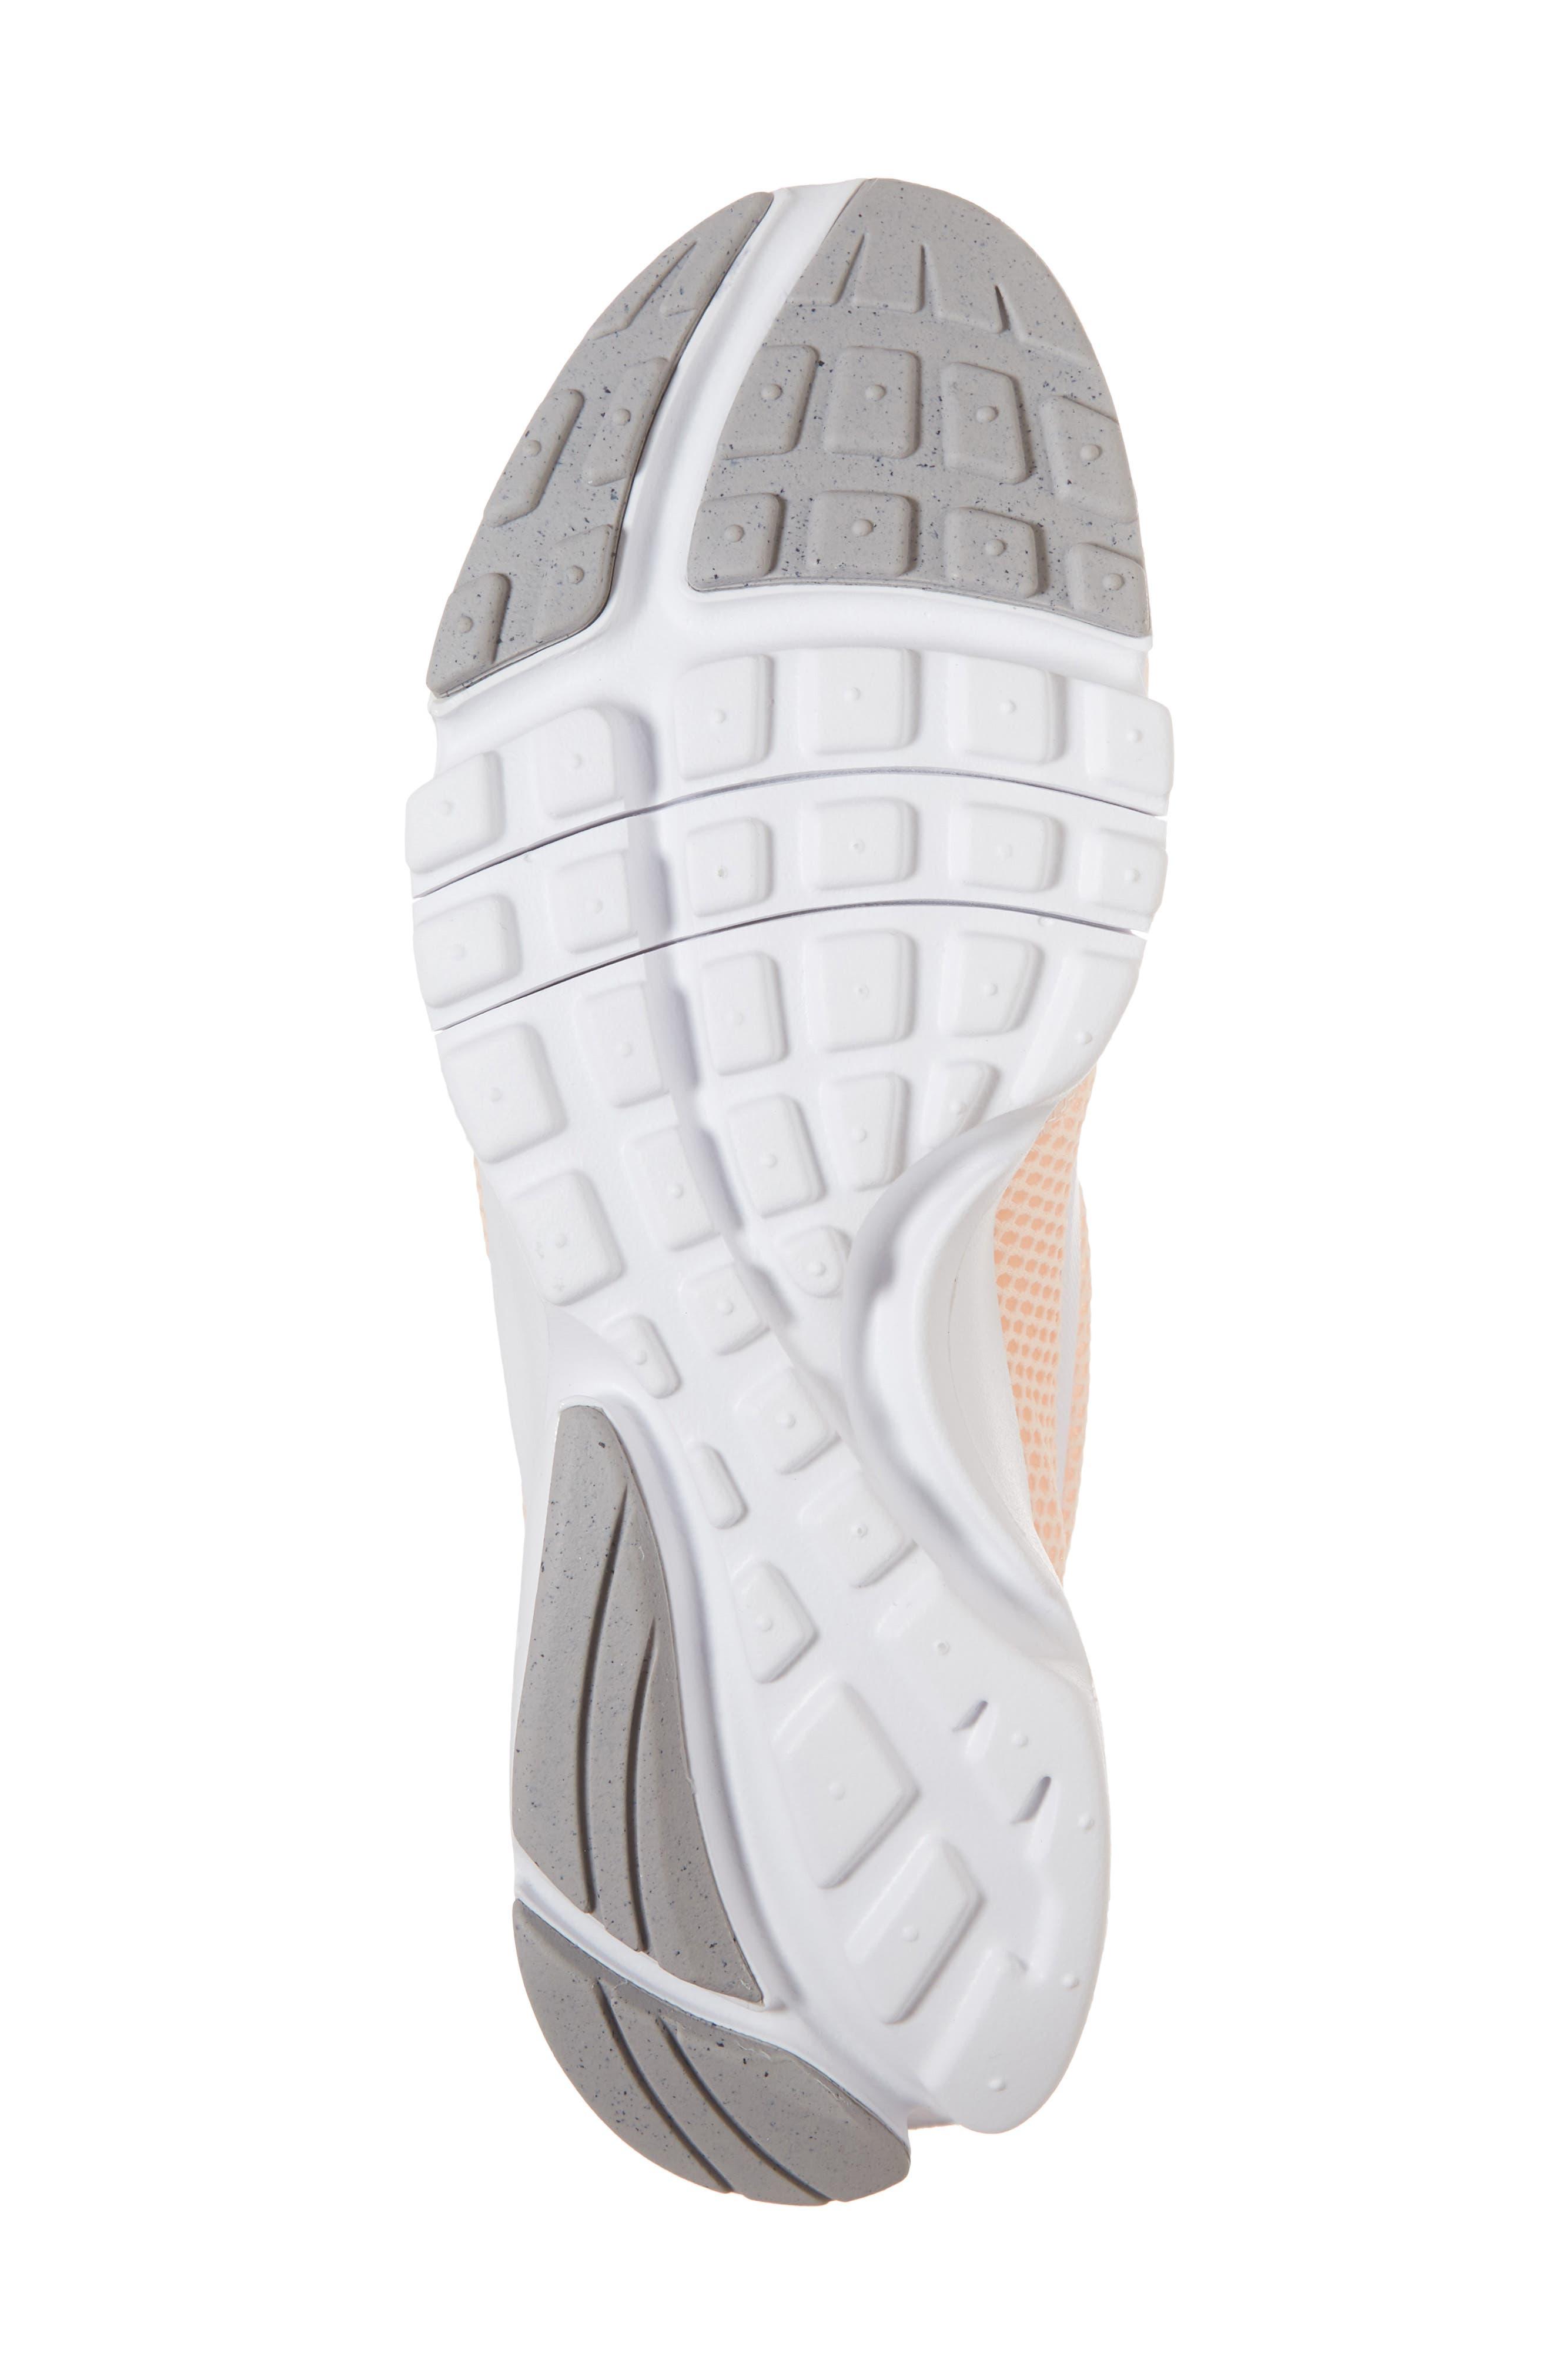 Presto Fly Sneaker,                             Alternate thumbnail 7, color,                             Crimson Tint/ White/ Grey